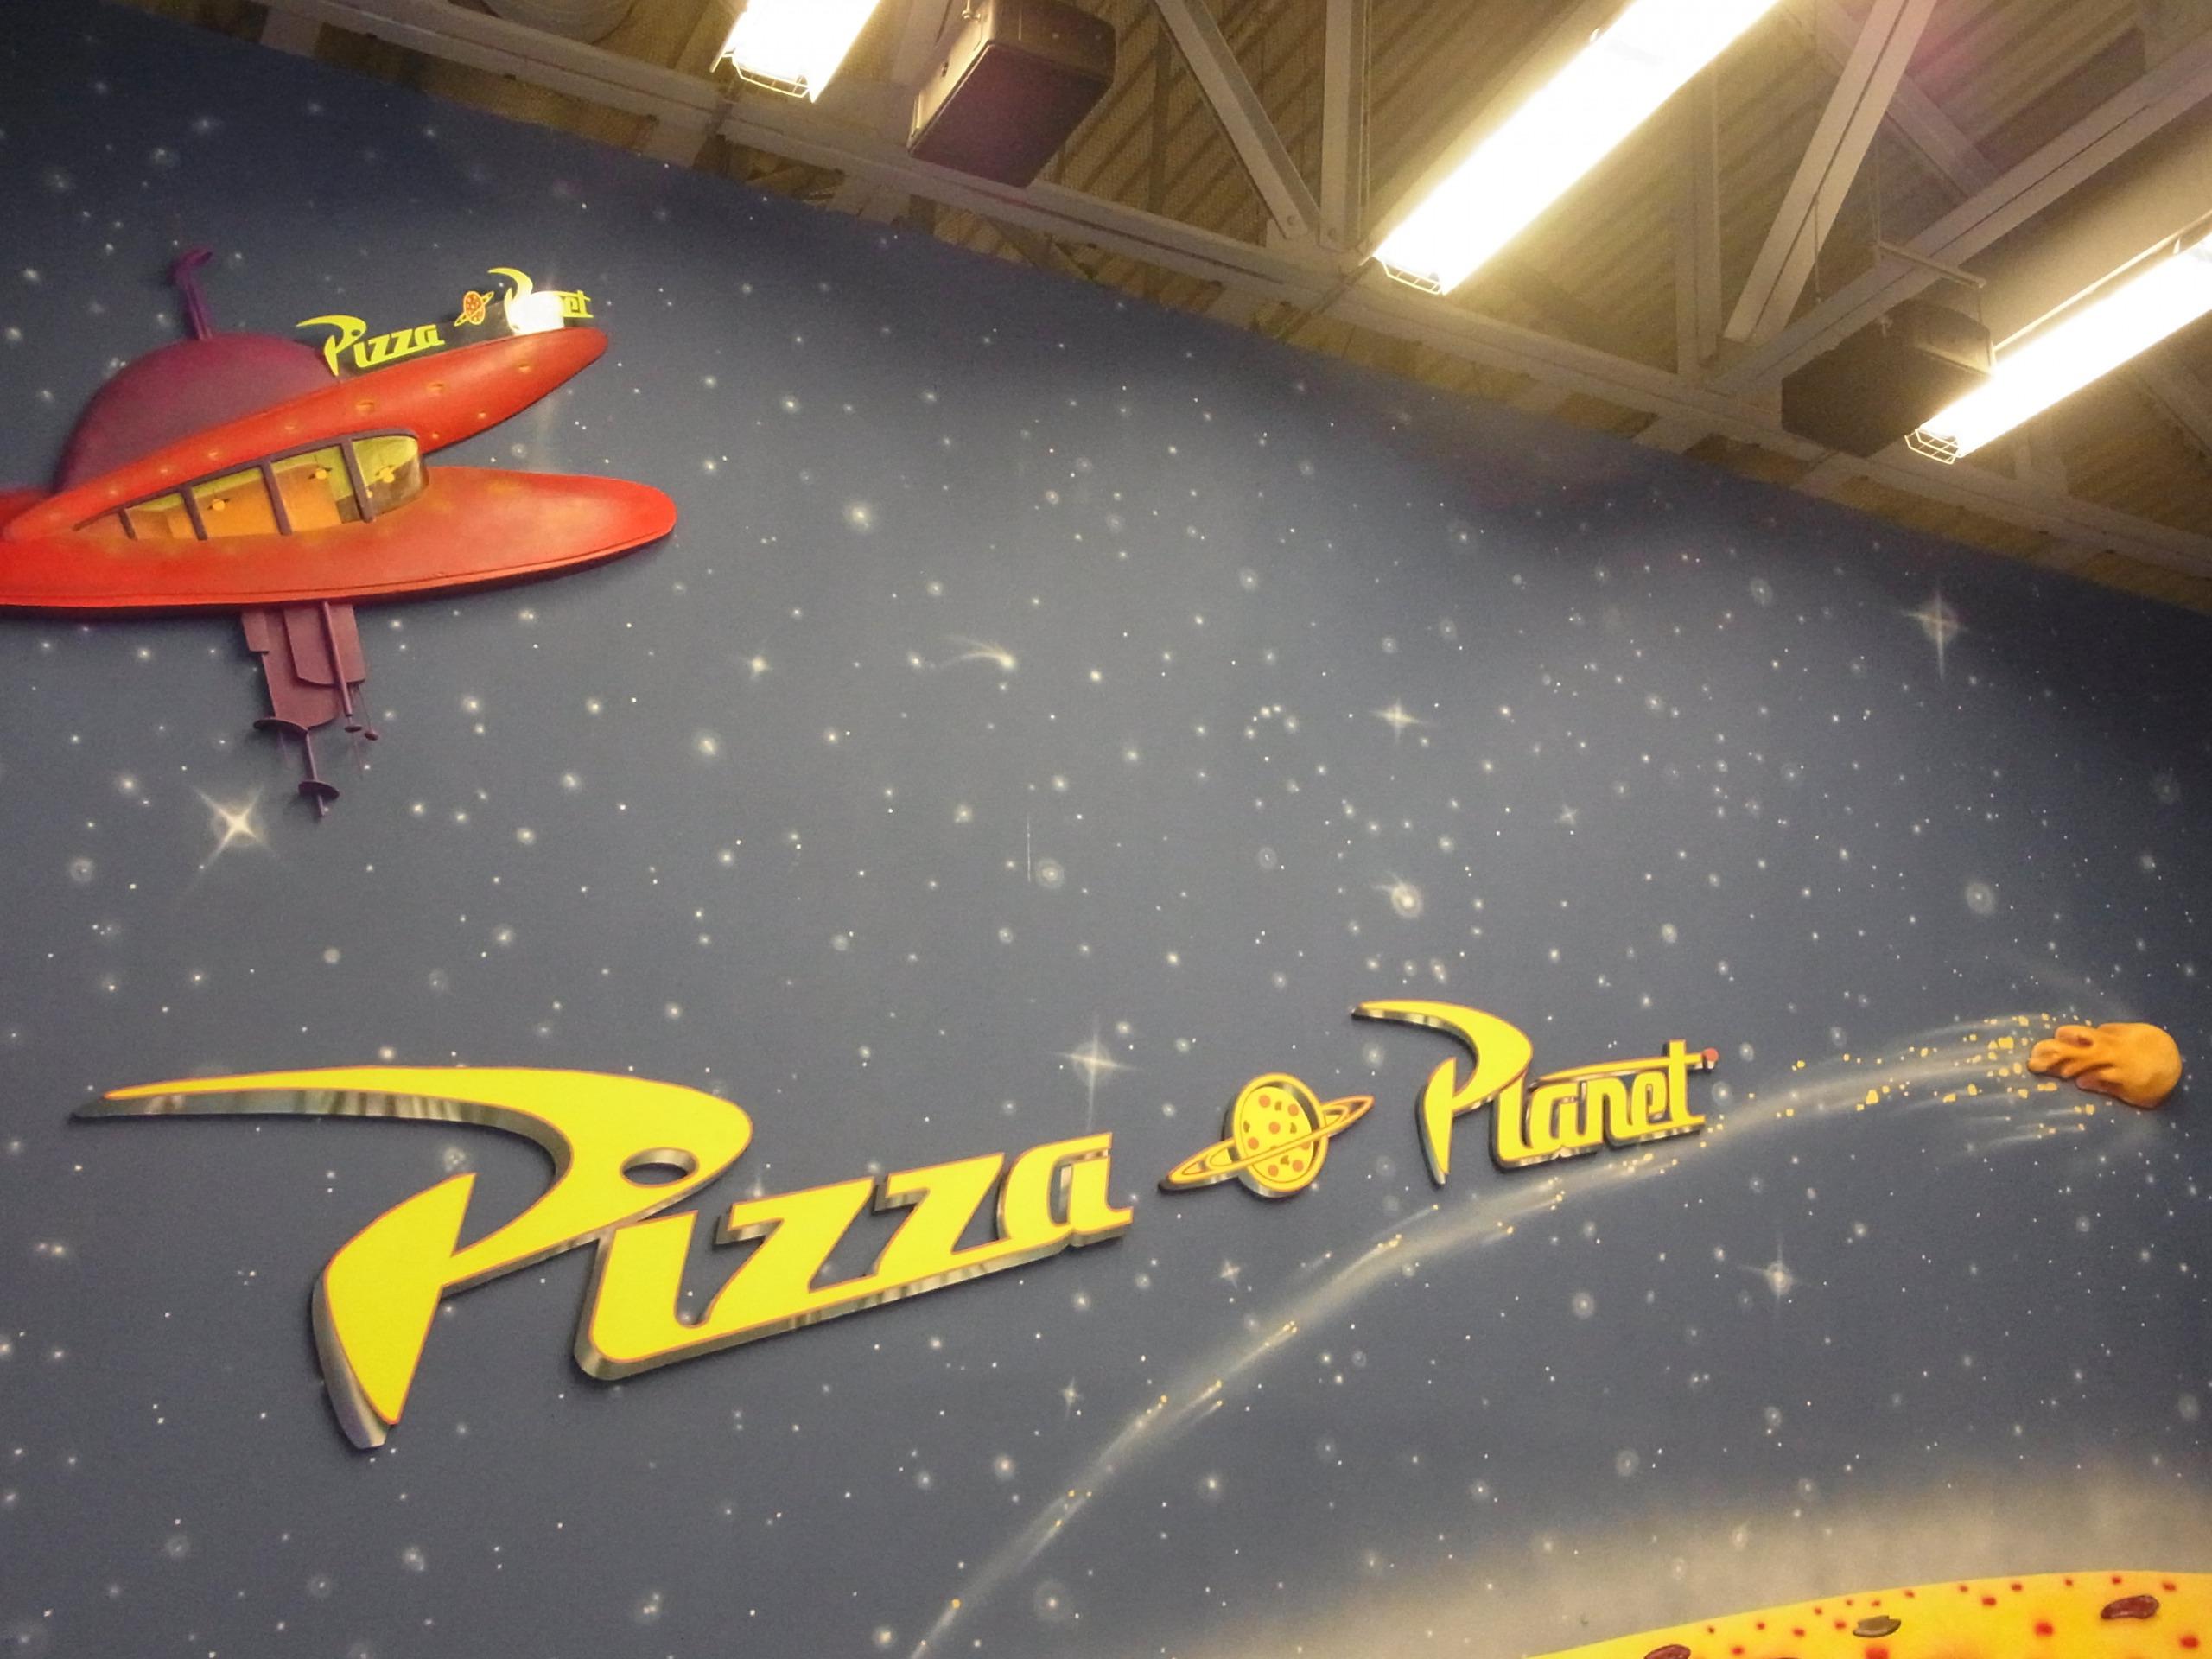 WDW旅行記 51 トイストーリー・ピザ・プラネットで昼食